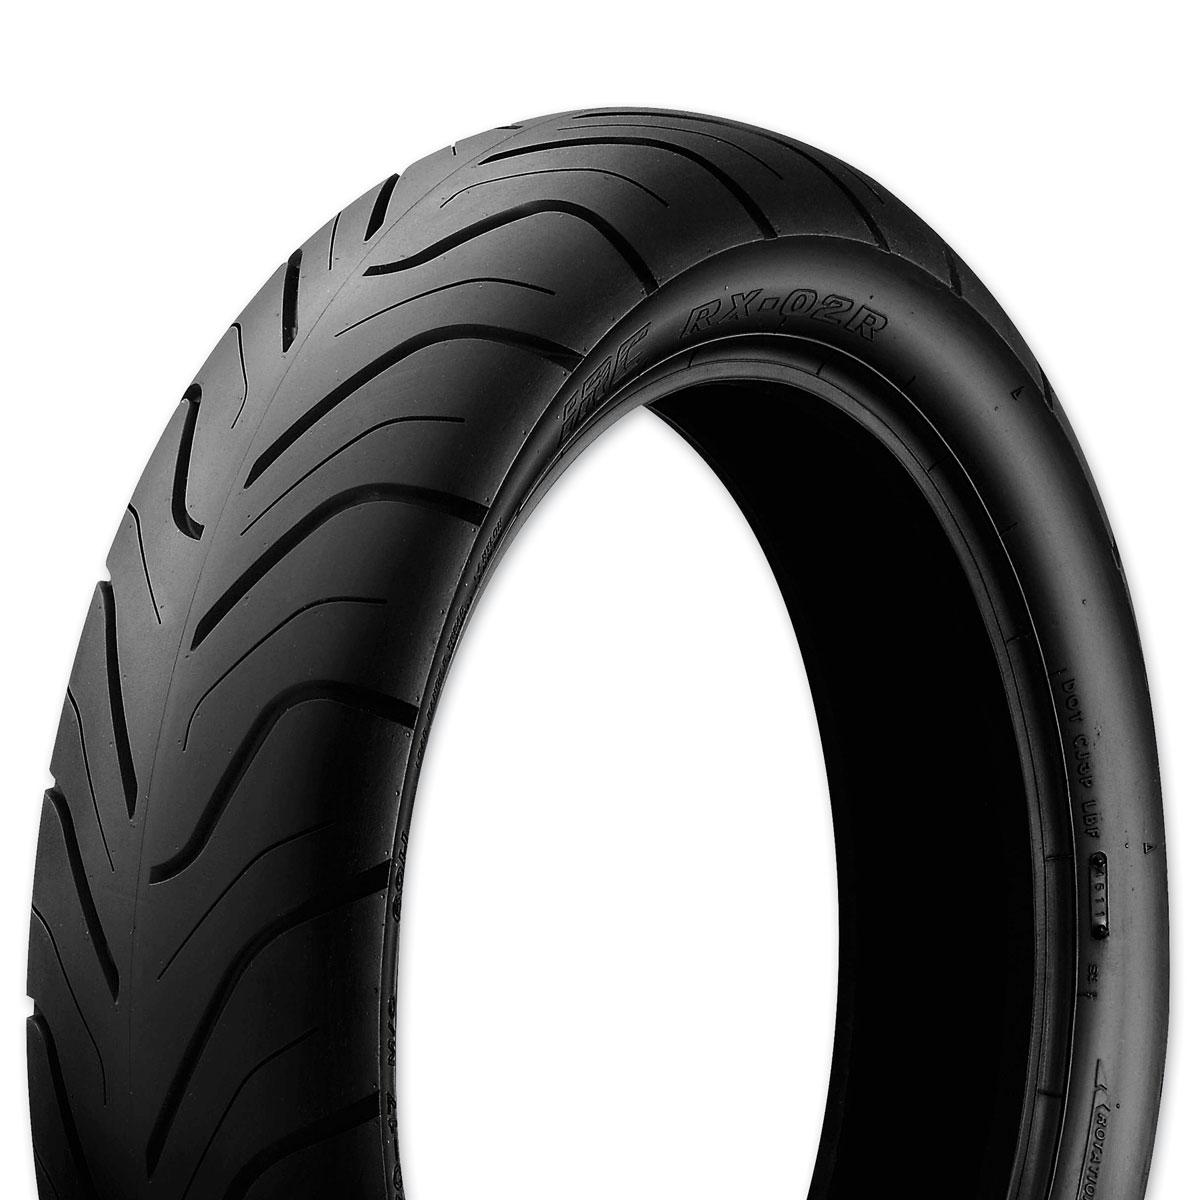 IRC RX-02 120/80-17 Rear Tire